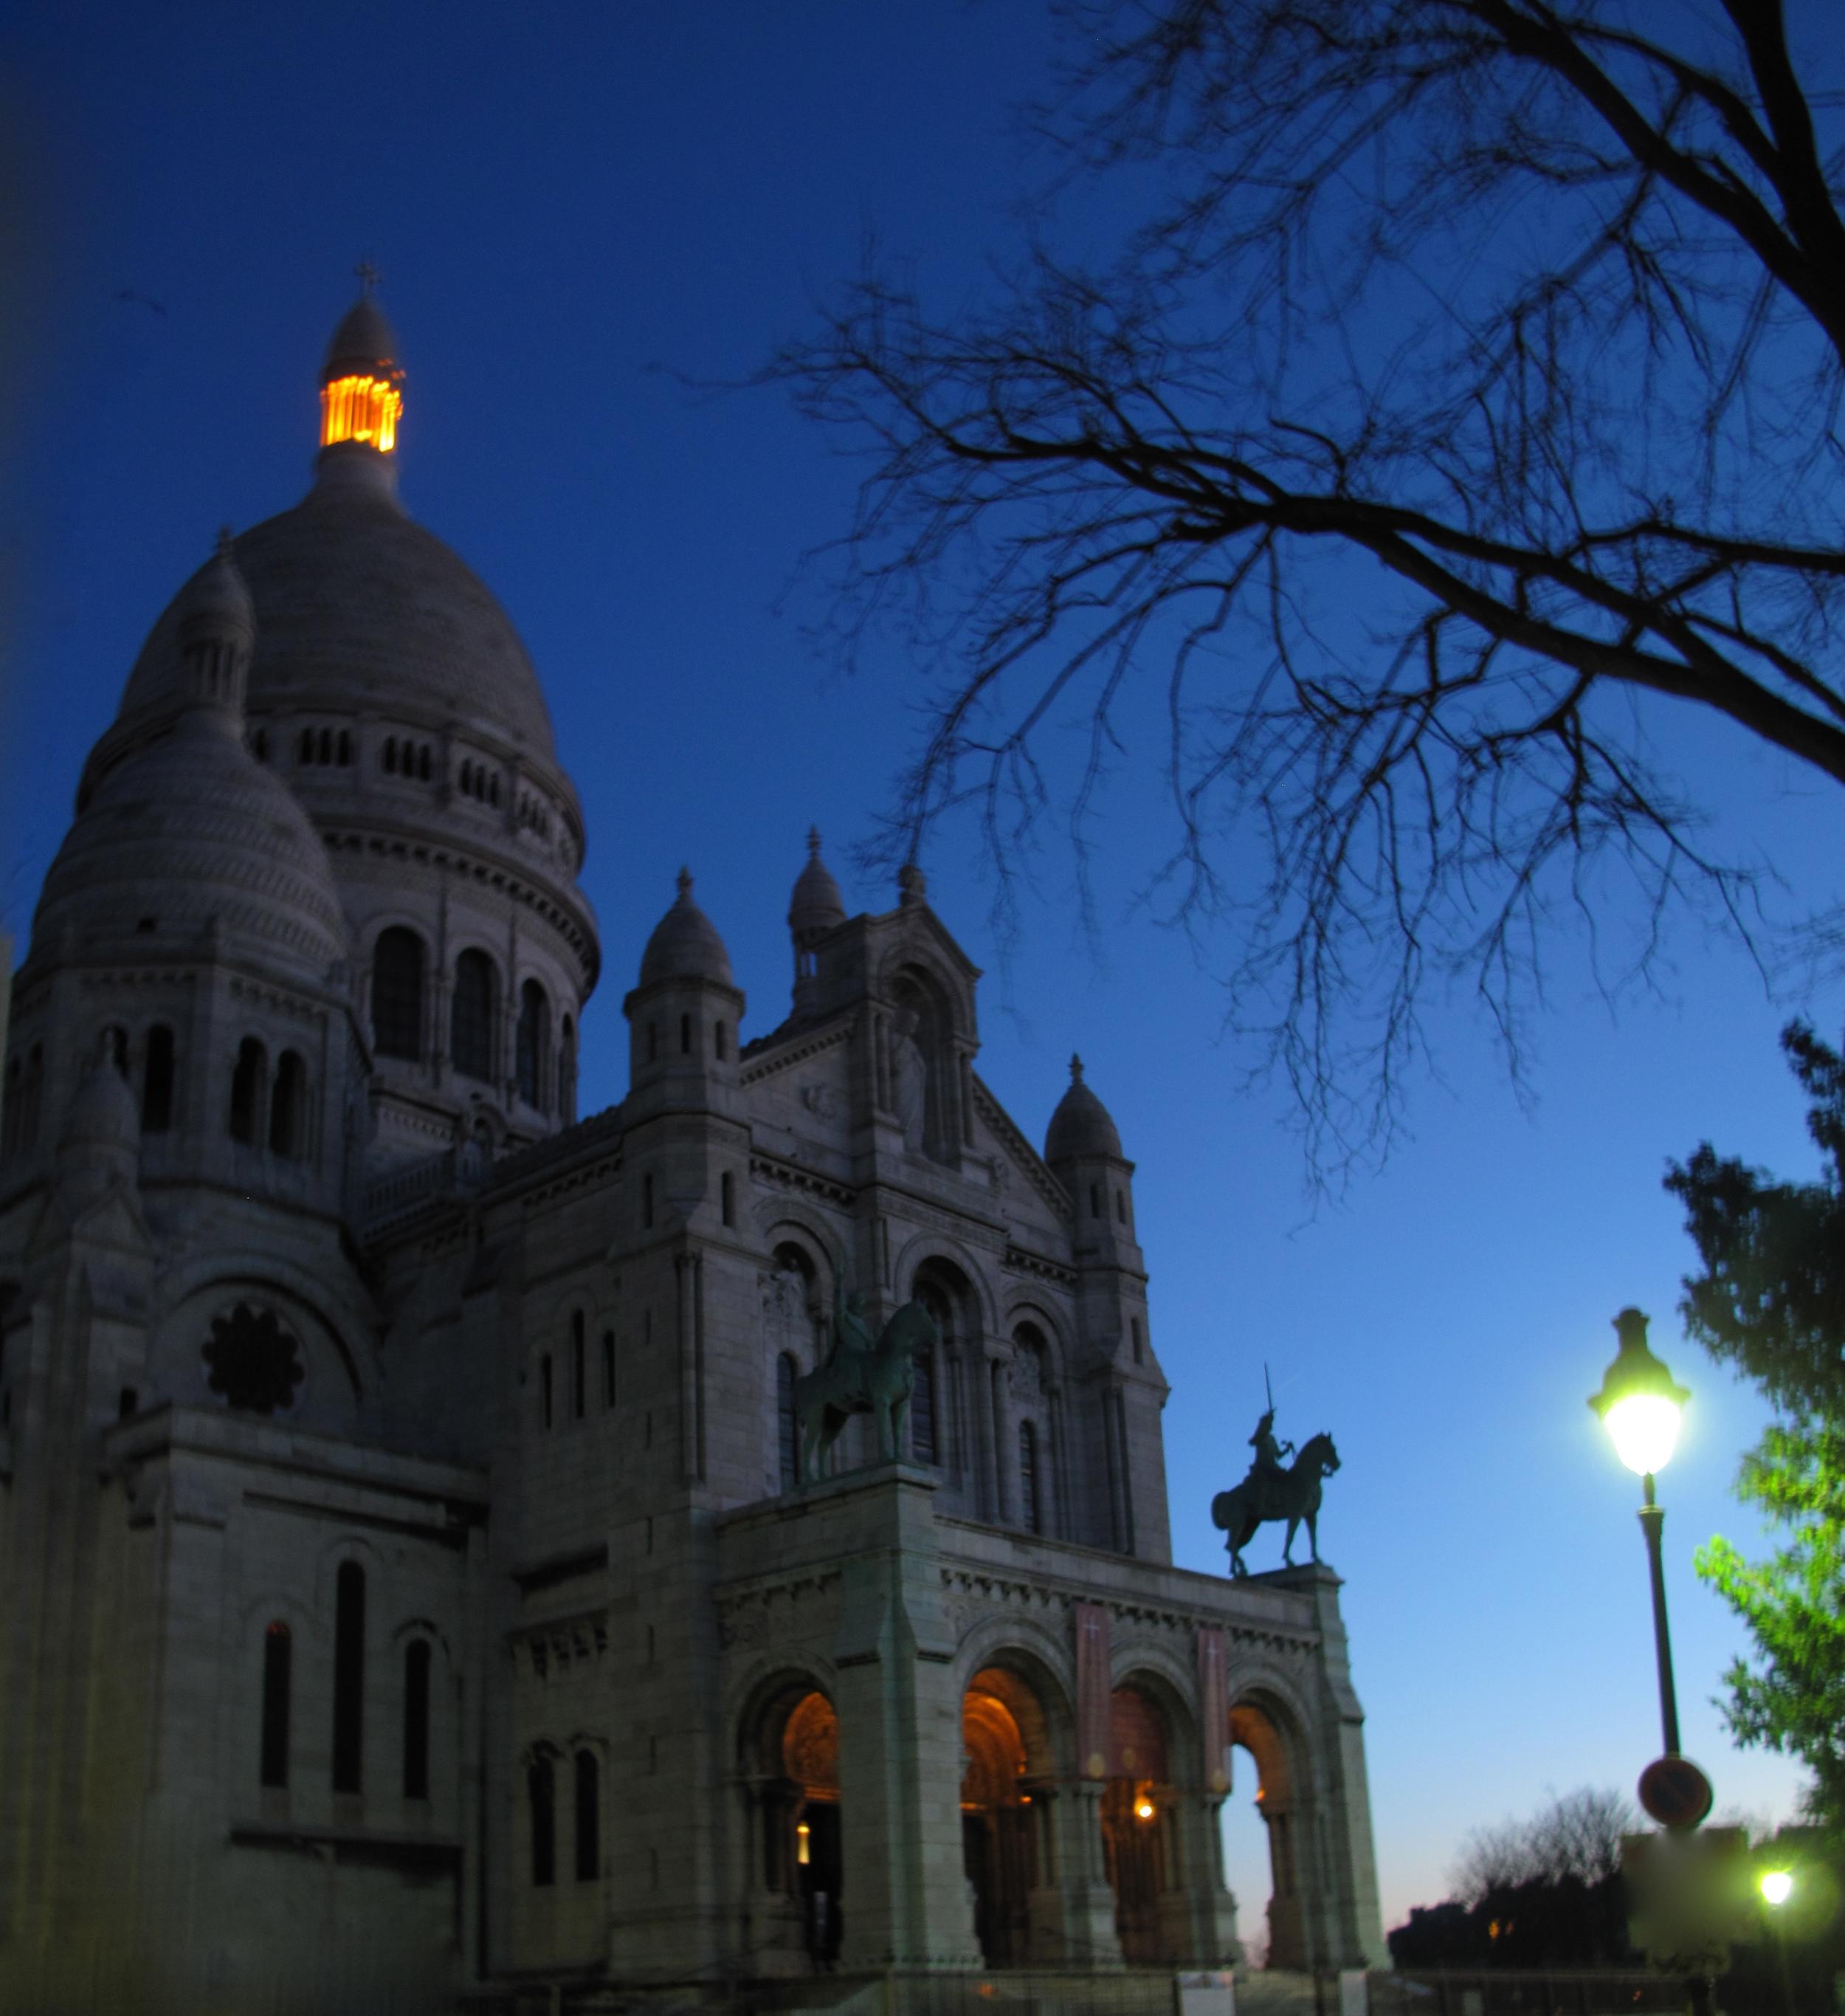 Sacrè Coeur before dawn, in the blue of the night